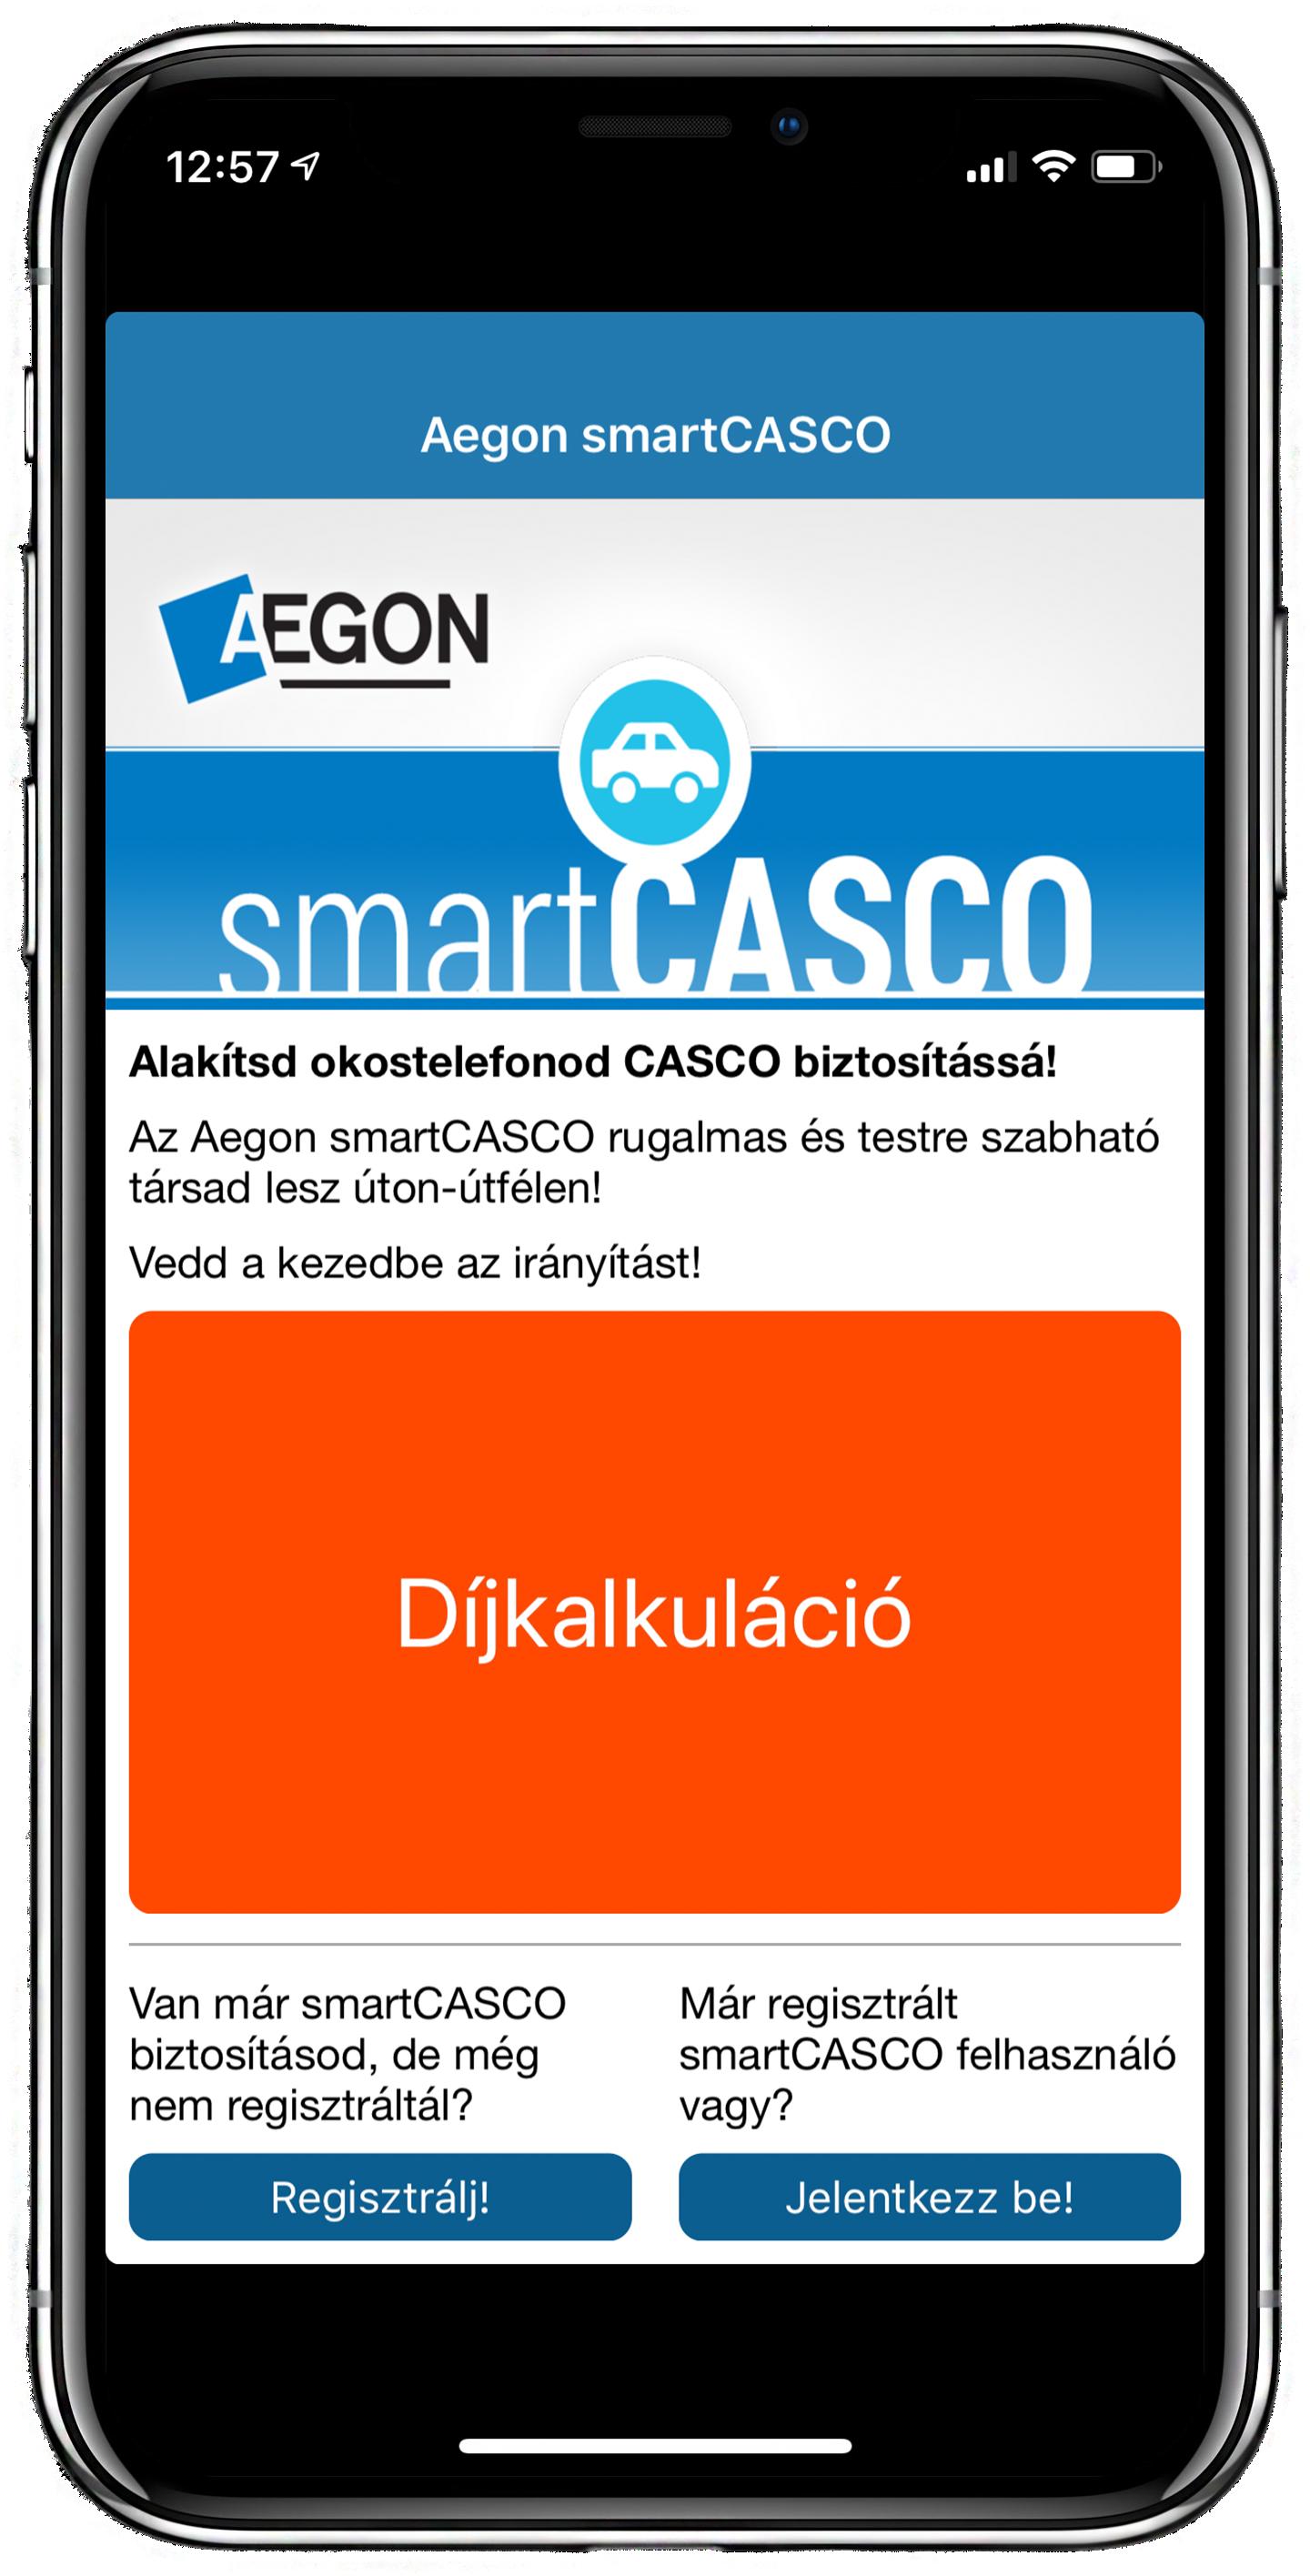 aegon_smartcasco.png